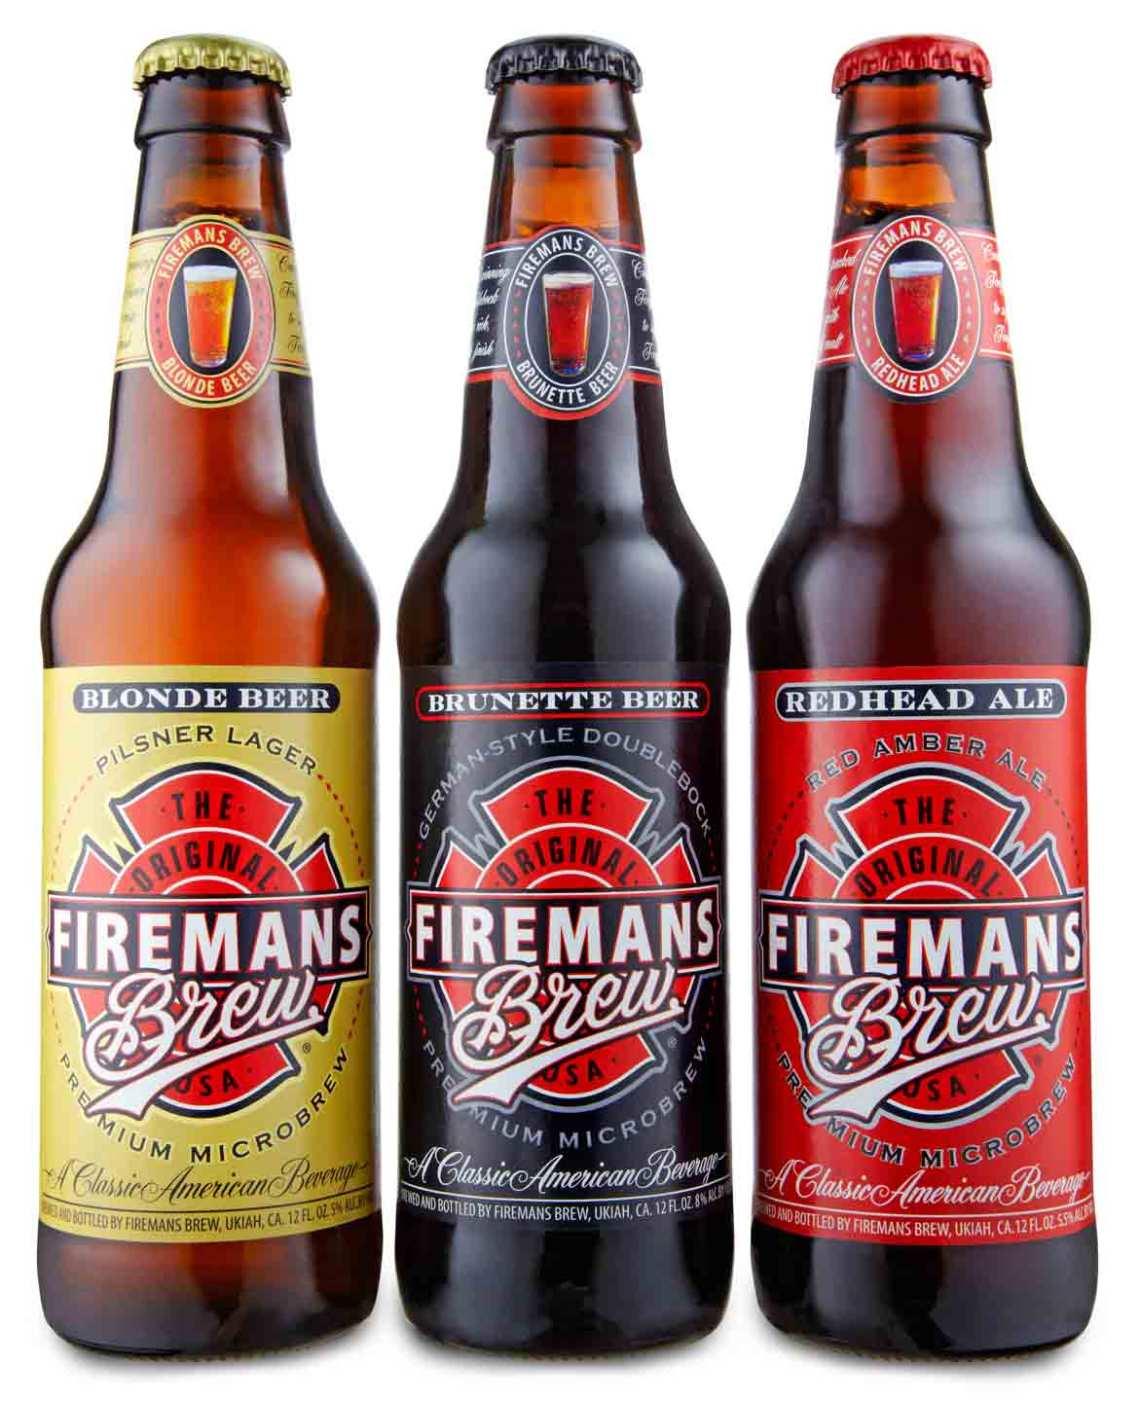 Firemans Brew Blonde Beer